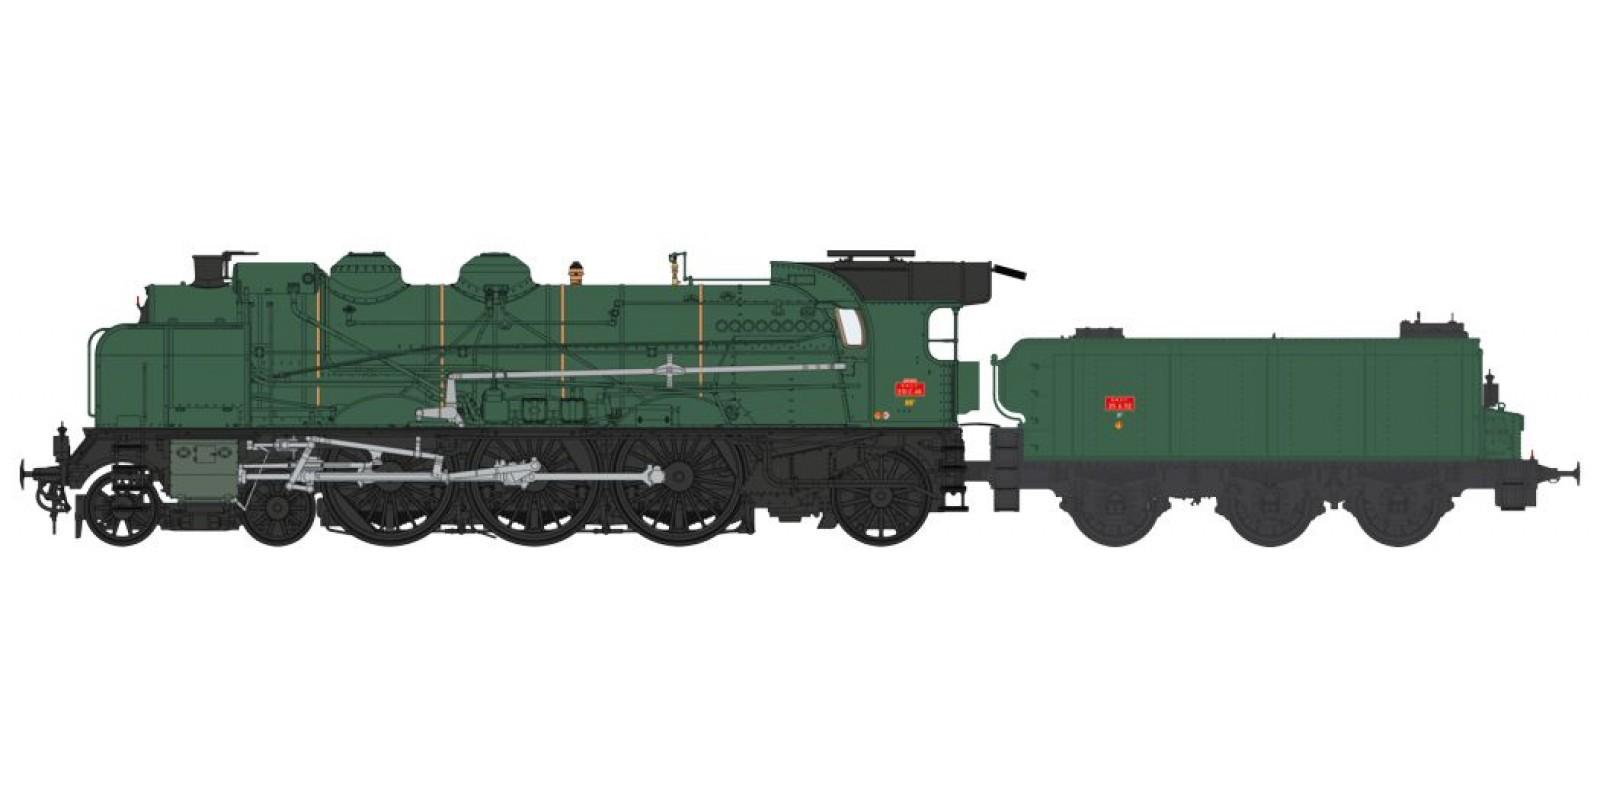 REMB137S 5-231 E 46 MONTARGIS depot, simple smoke stack, smoke deflectors, Fives-Lille air pump, ACFI preheating, 25m³ tender, SNCF green - DCC Sound & Smoke